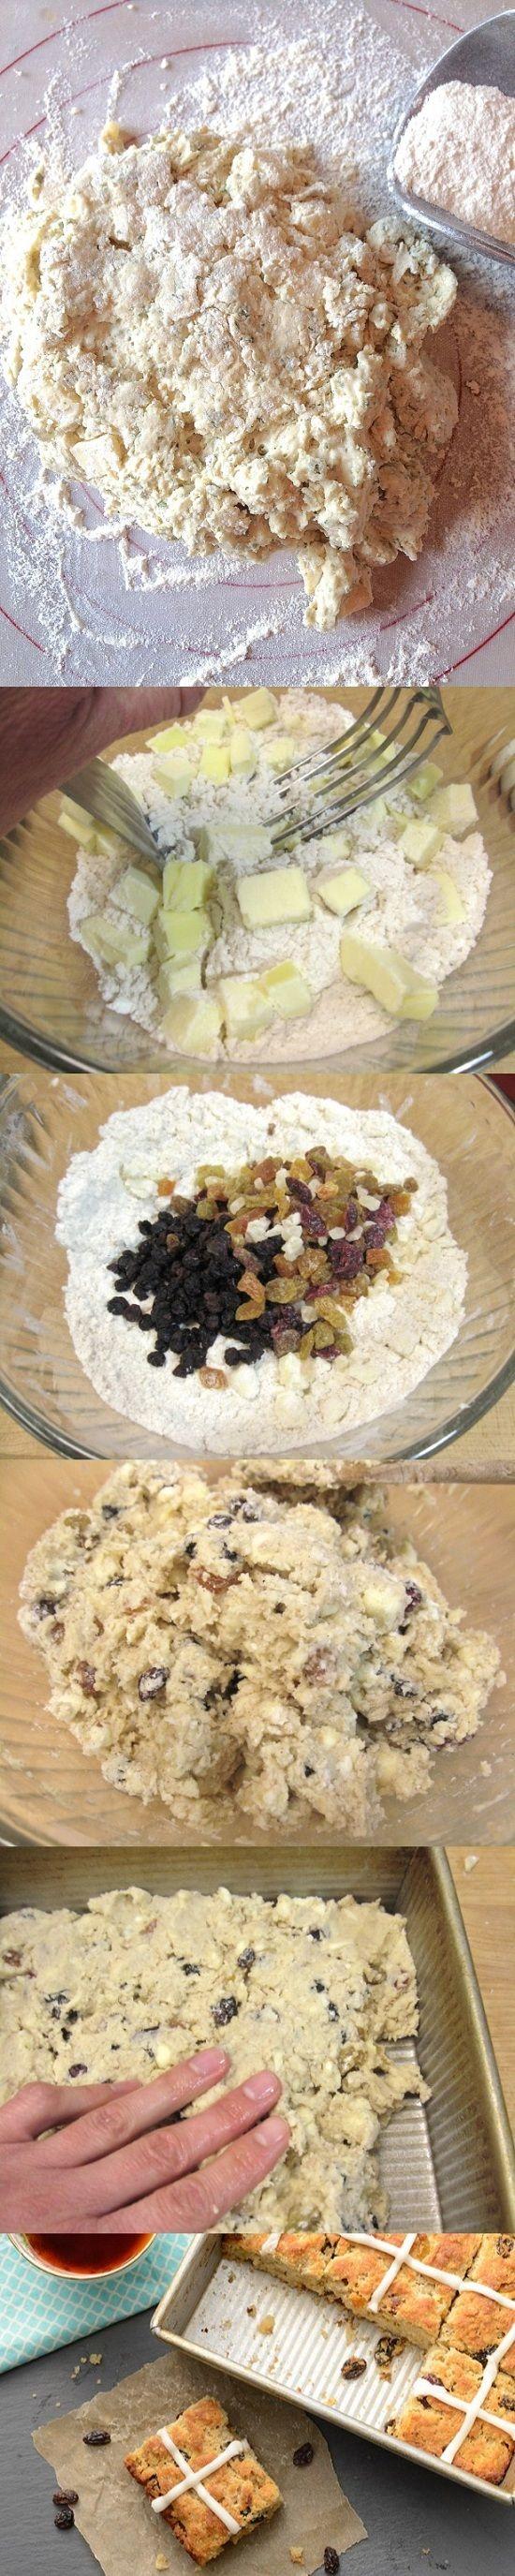 Gluten-Free Hot Cross Biscuits Recipe | Recipes | Pinterest